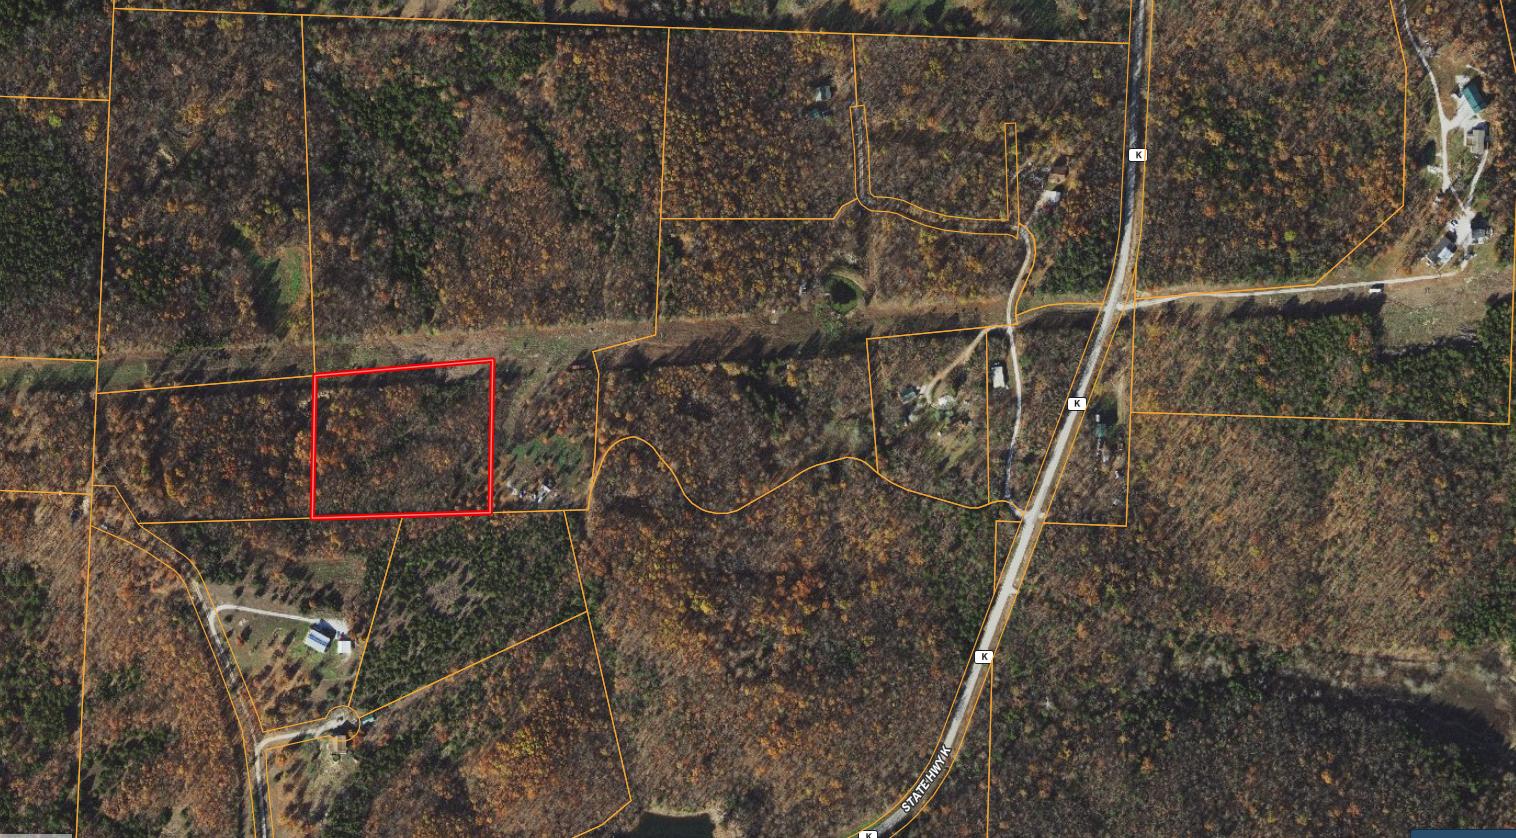 Land for Sale near Truman Lake, Warsaw Missouri